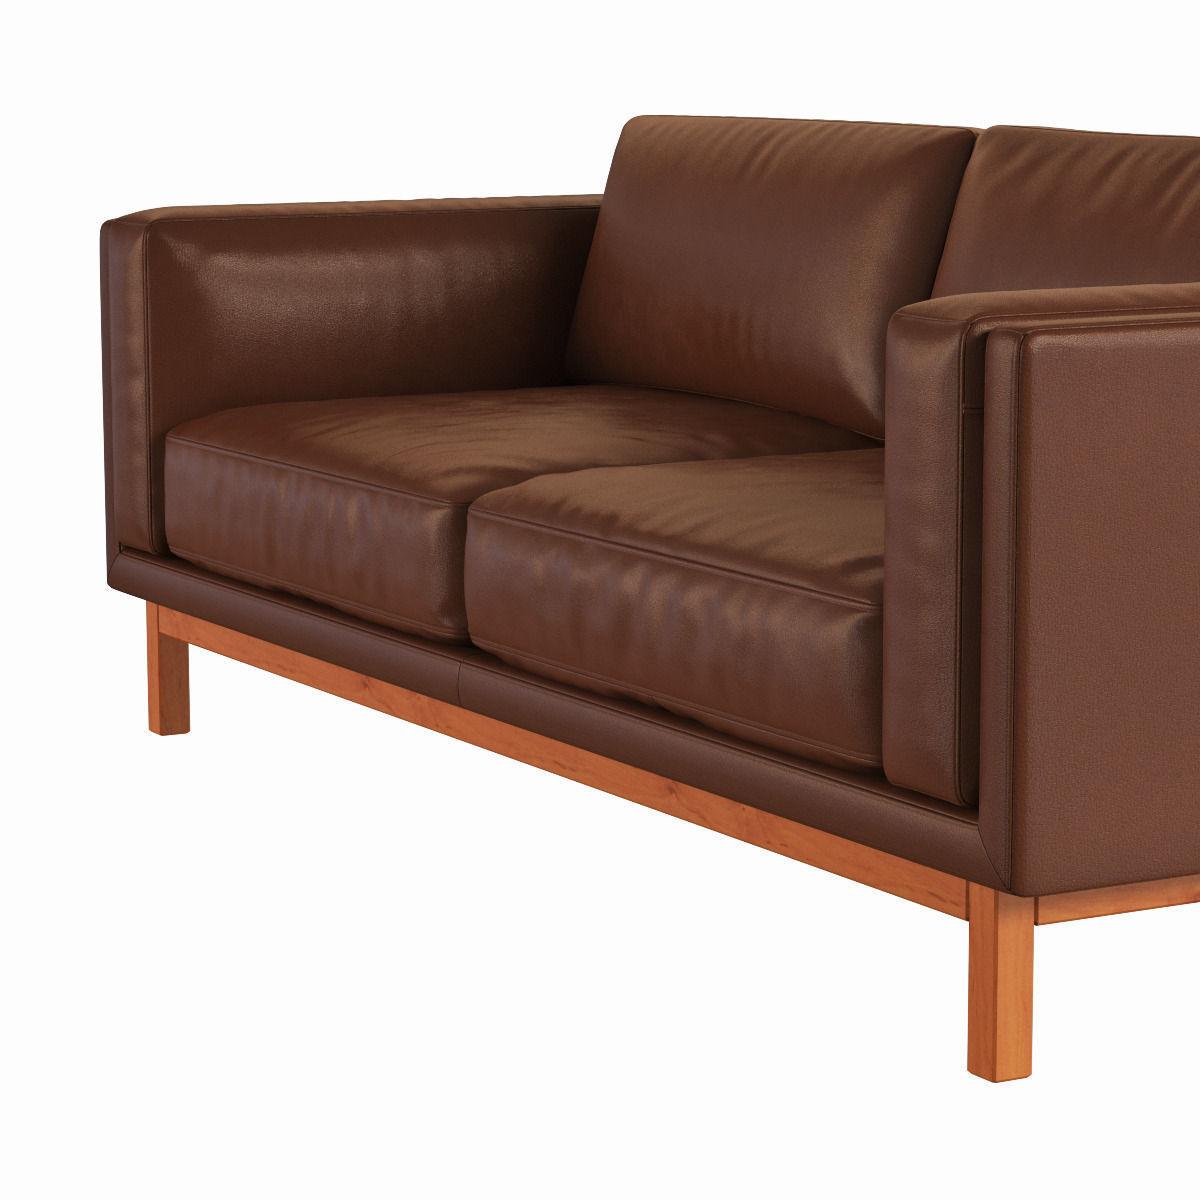 West Elm Dekalb Leather Sofa 3d Model Max Obj Fbx